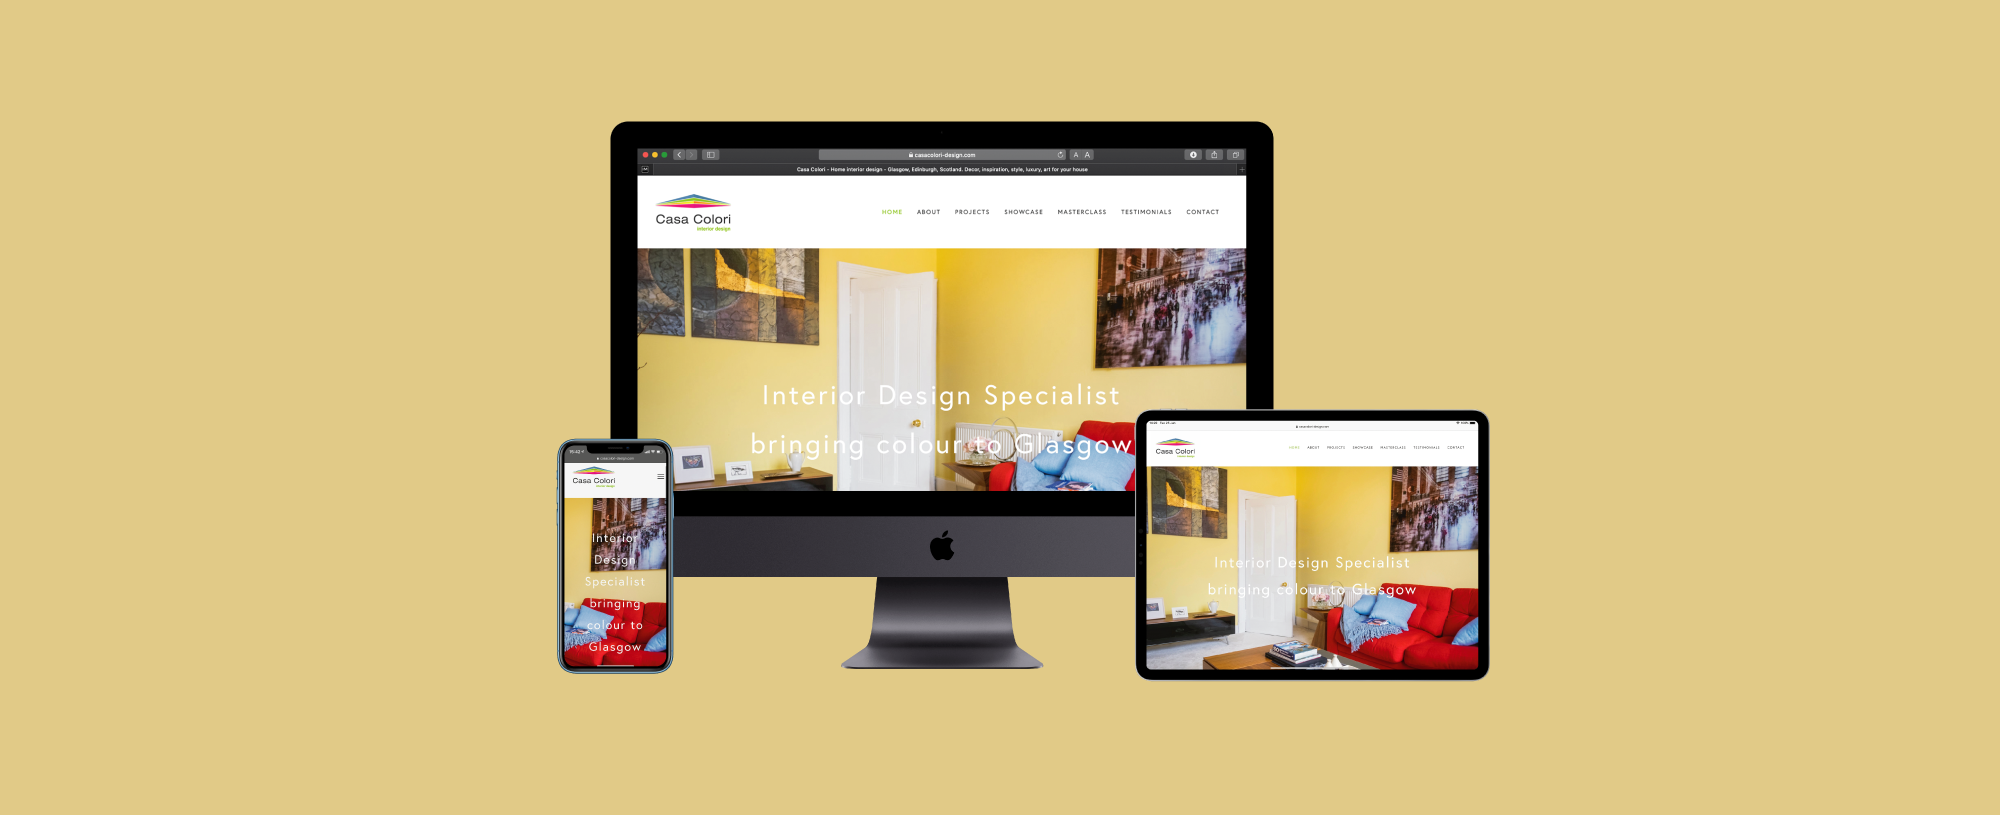 Casa Colori Website